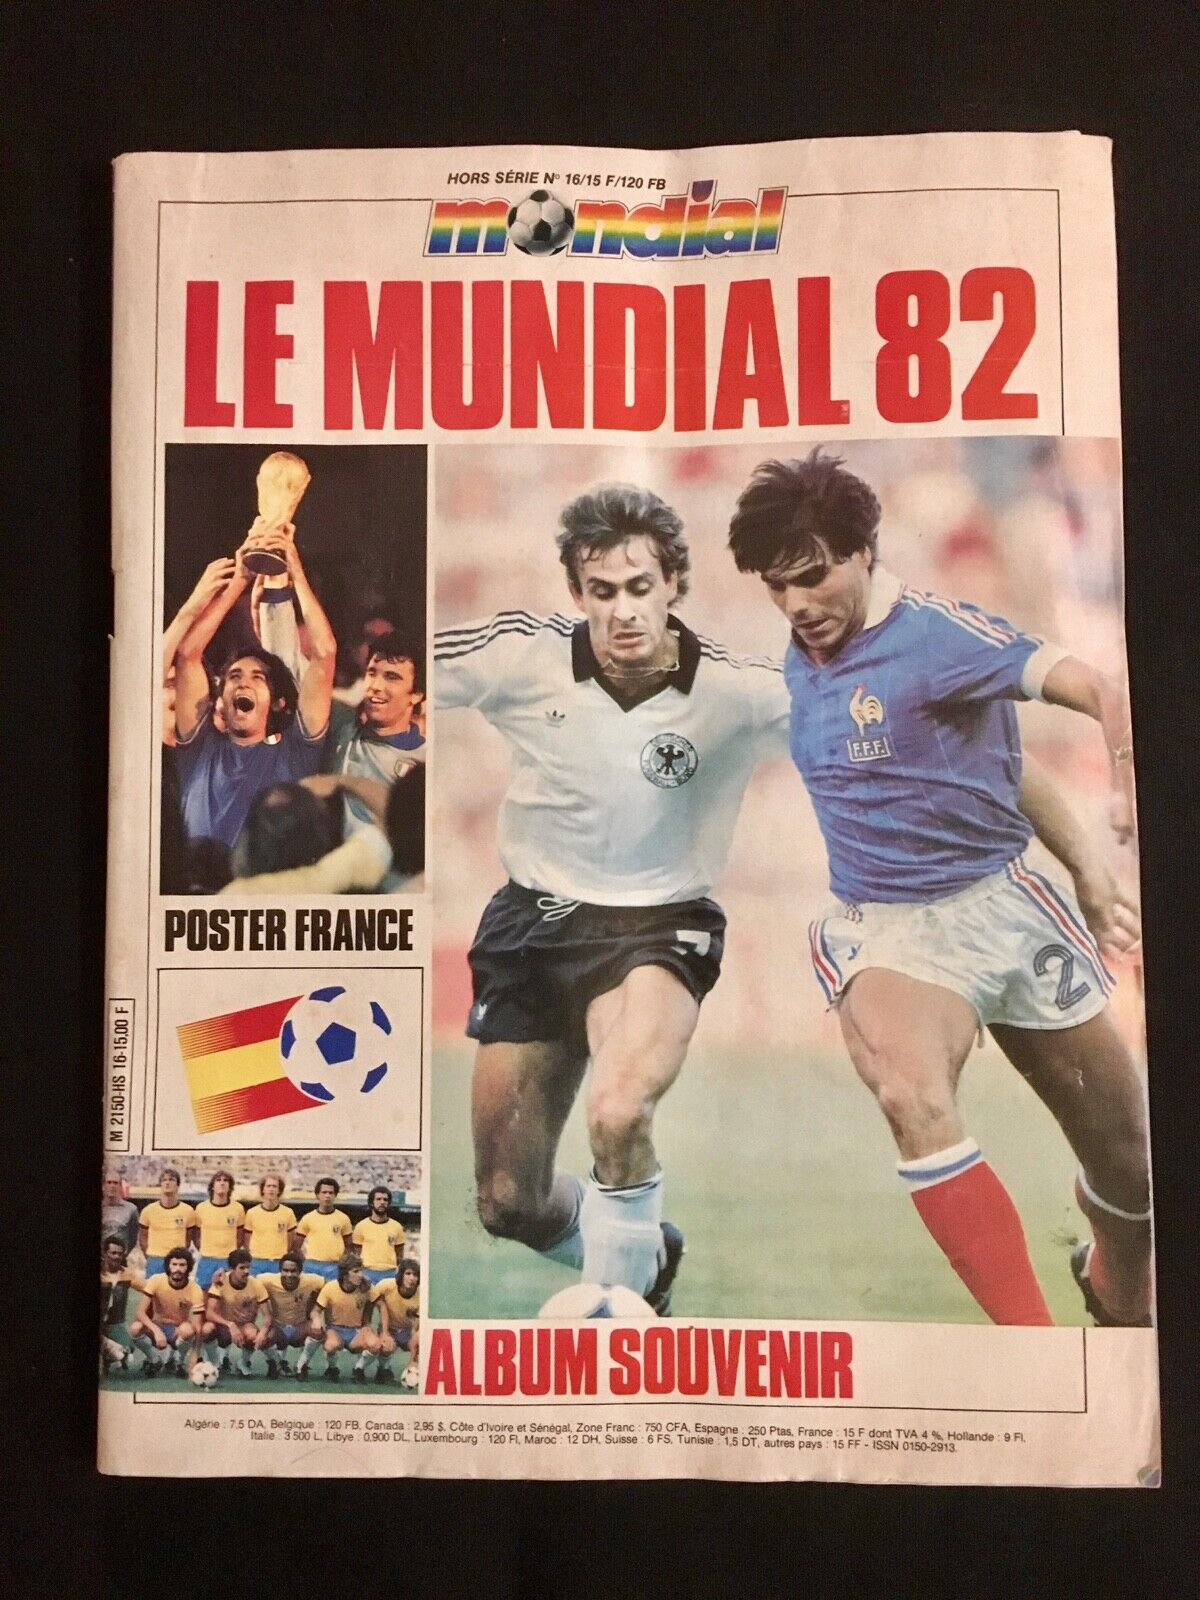 MAGAZINE MONDIAL Nº 16 15 LE MUNDIAL 82 - ALBUM SOUVENIR 1982 ESPAGNE 1982